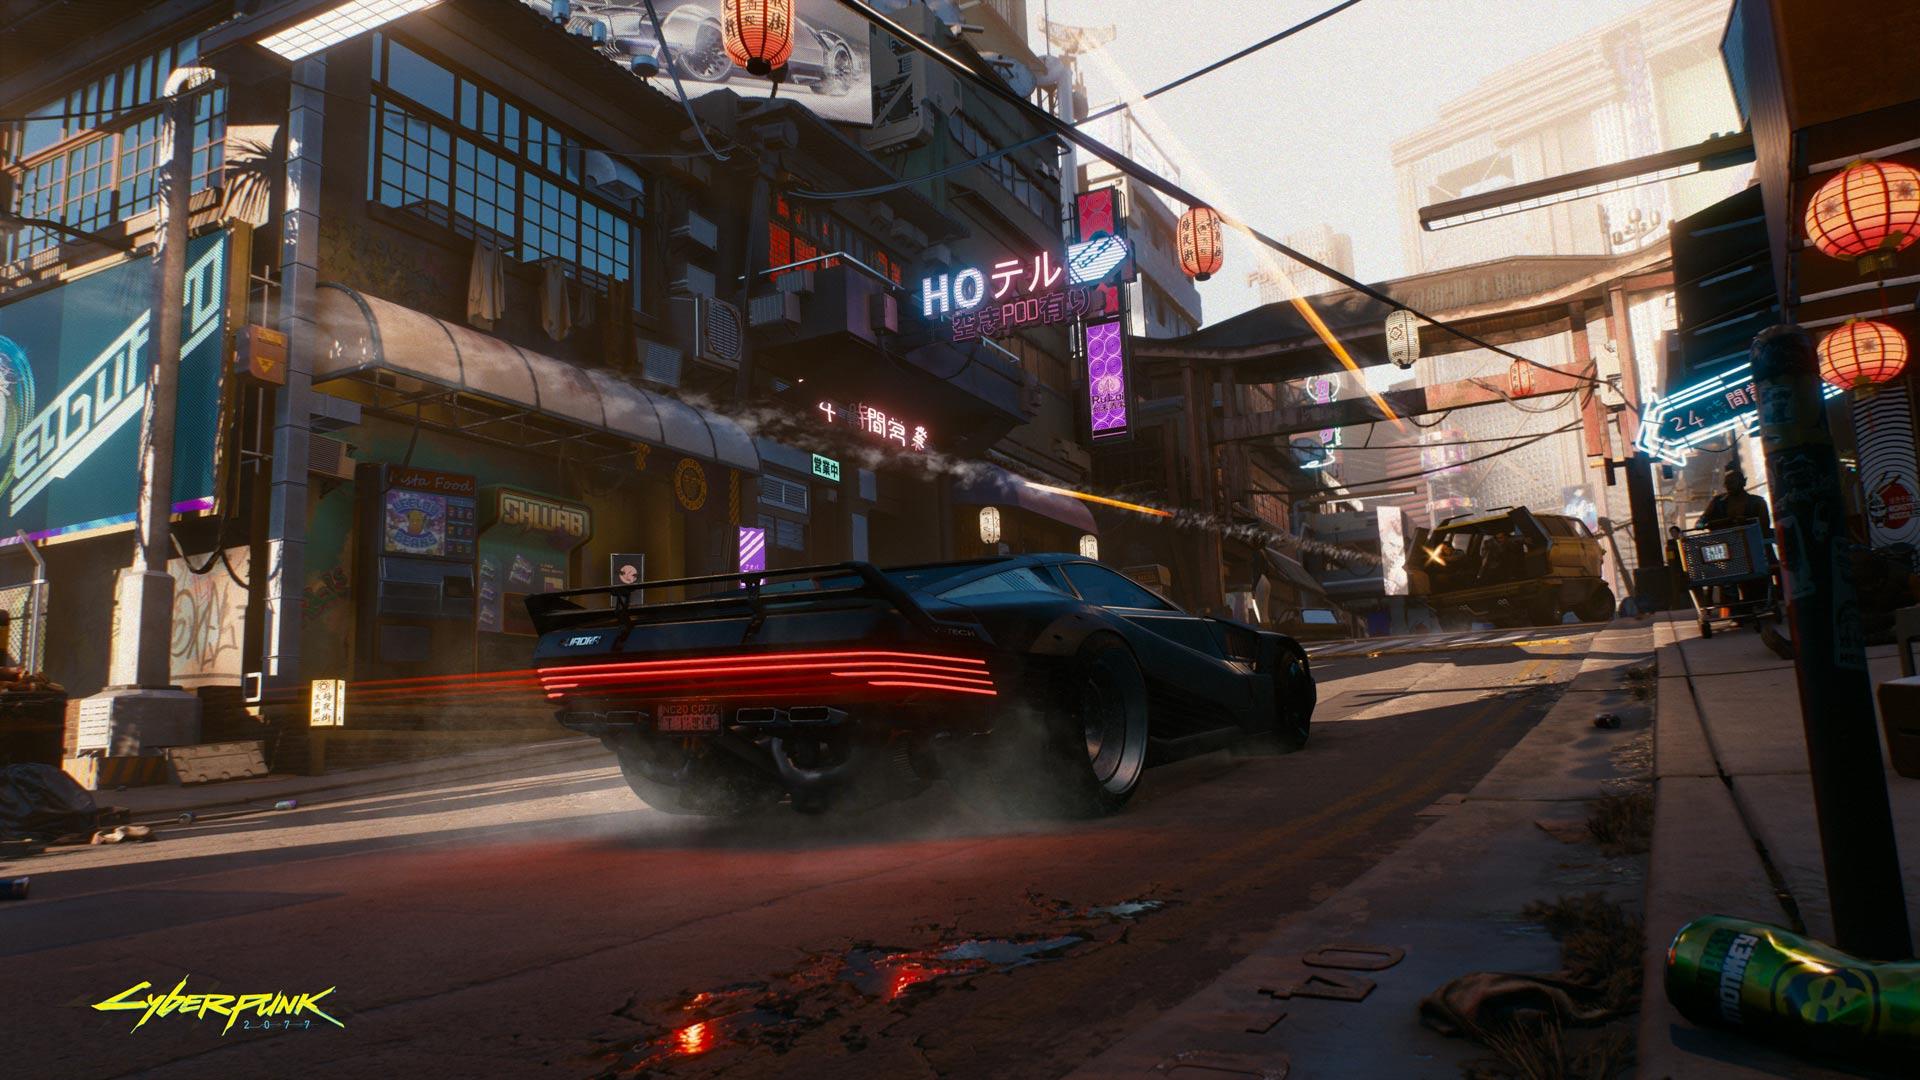 Cyberpunk 2077: Cyberpunk transport